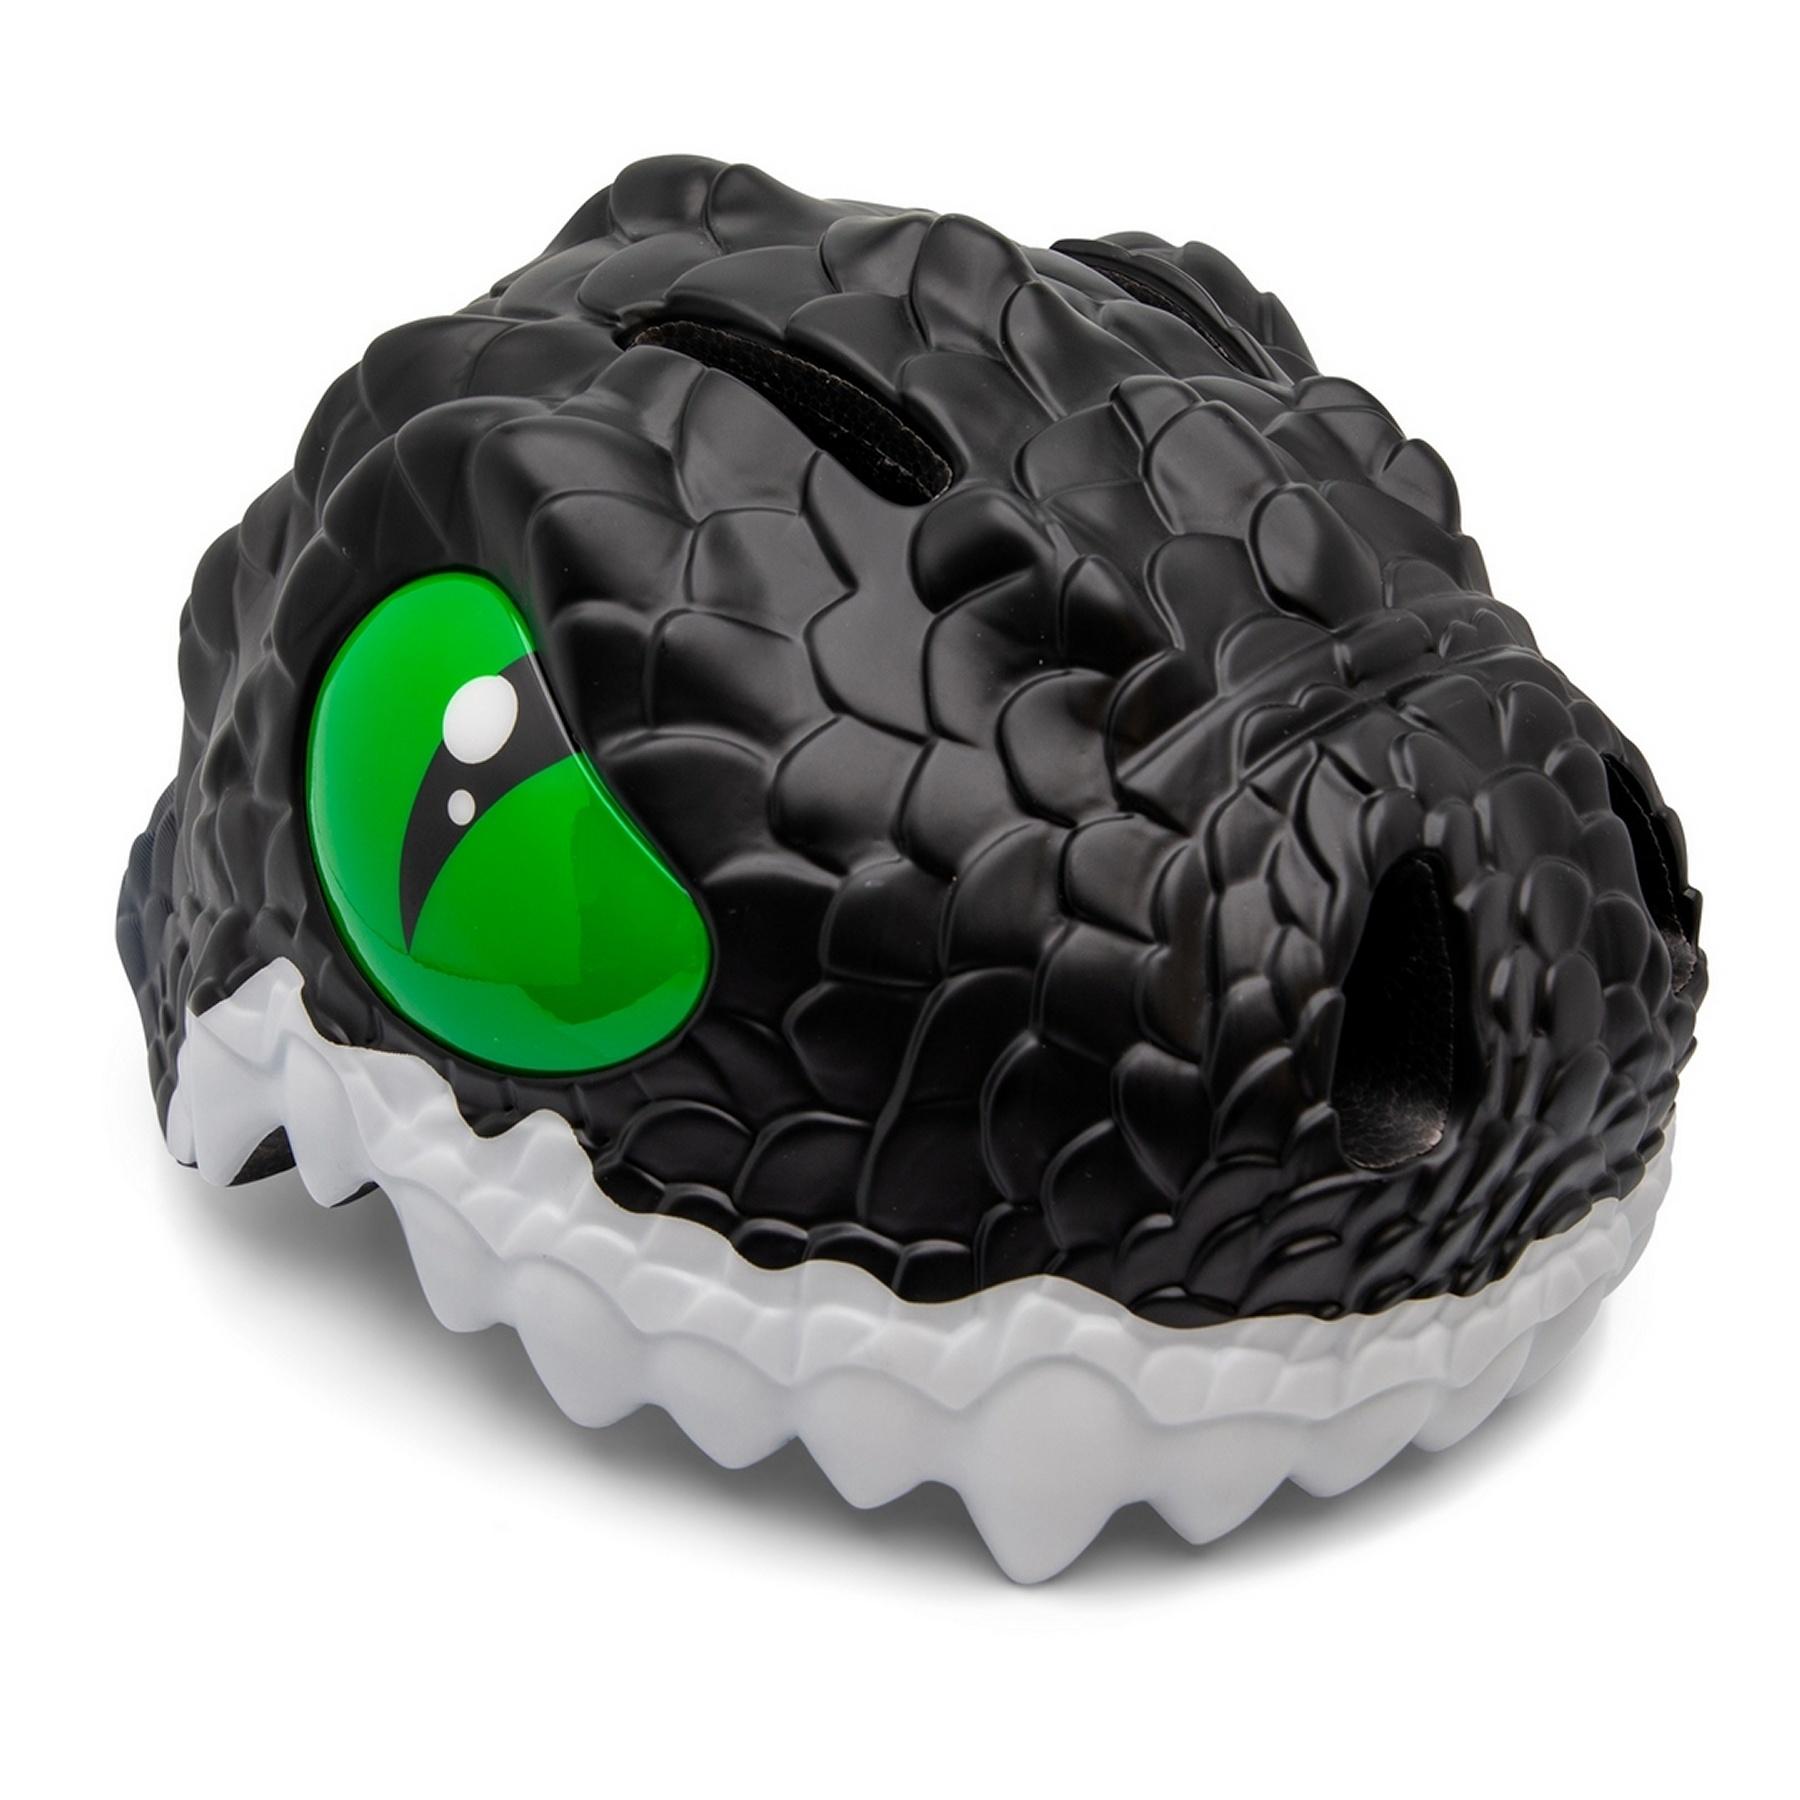 Kinderhelm - Fietshelm Zwarte Draak - Black Dragon Small 49-55 cm